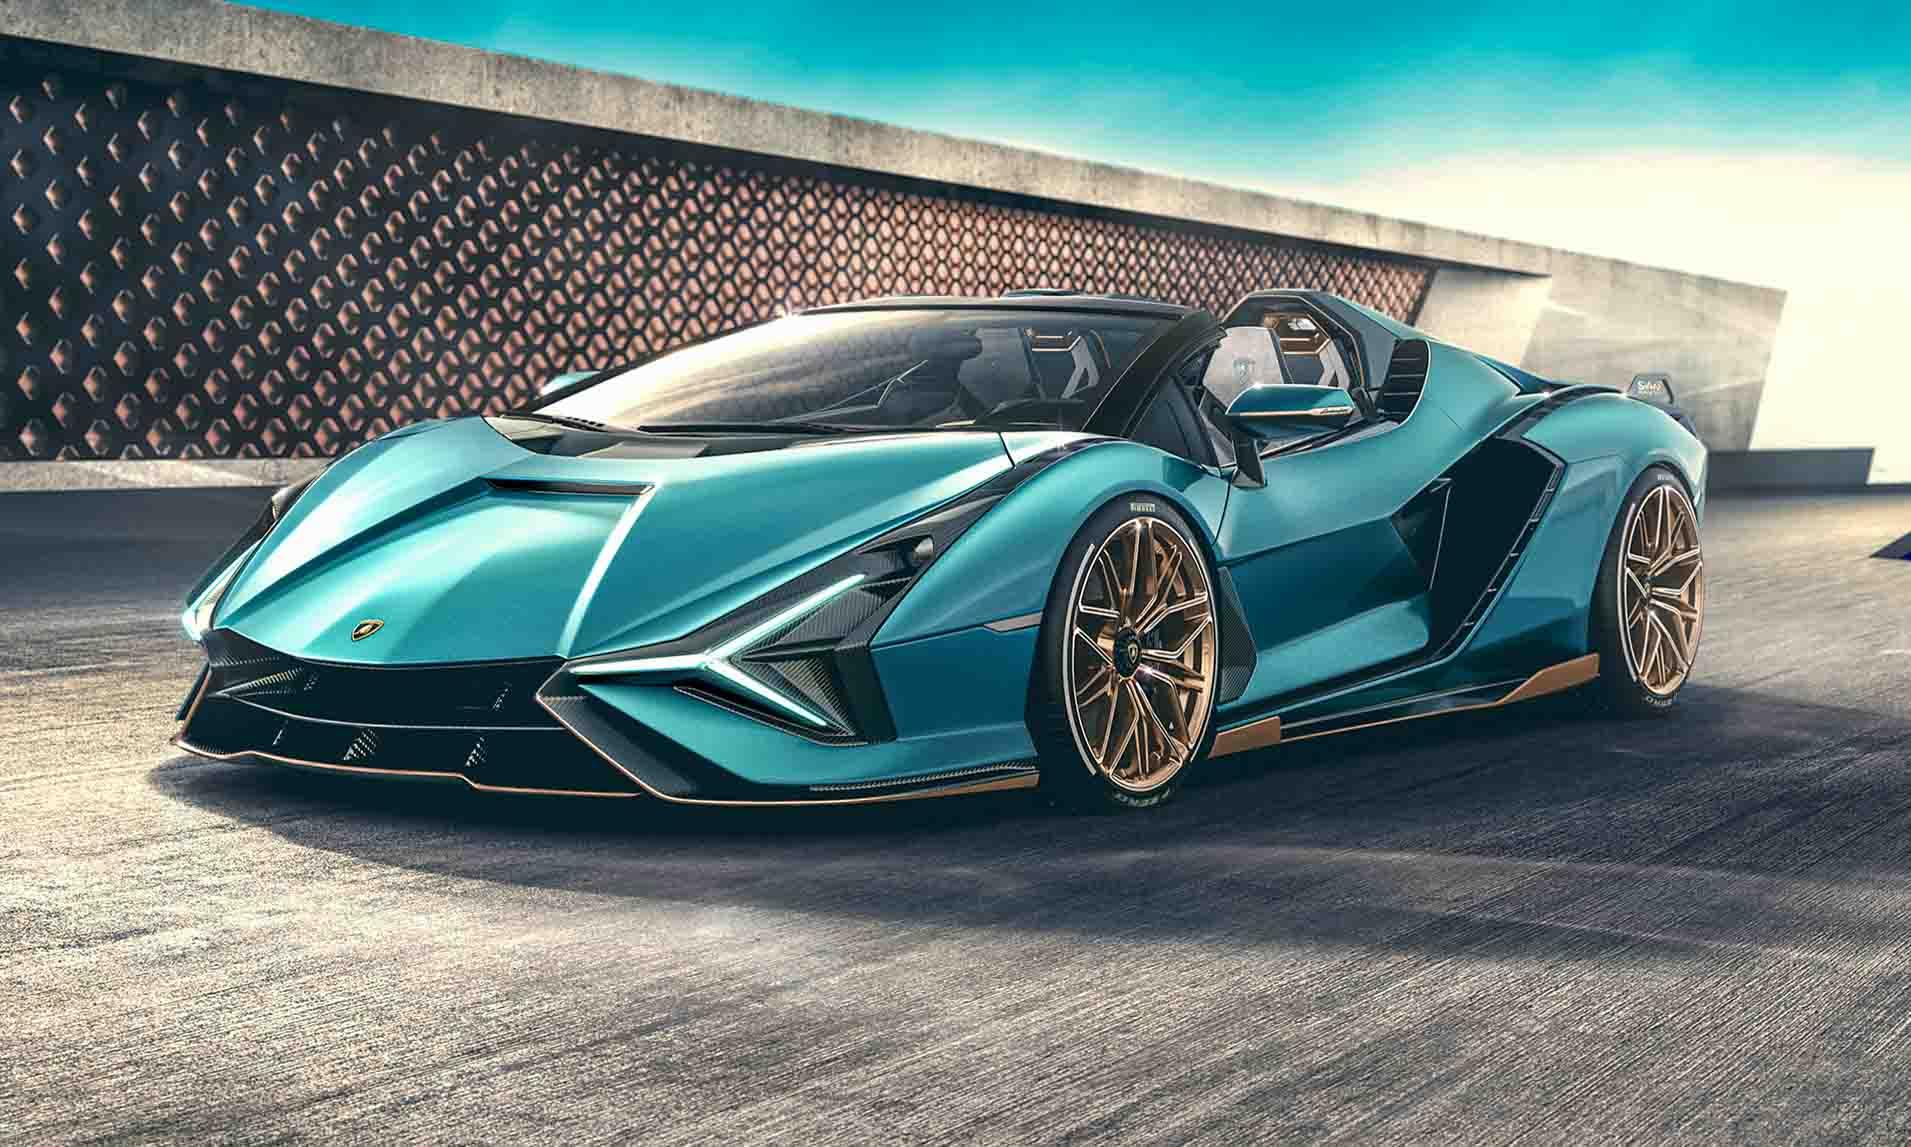 Lamborghini Sian Roadster: First Look